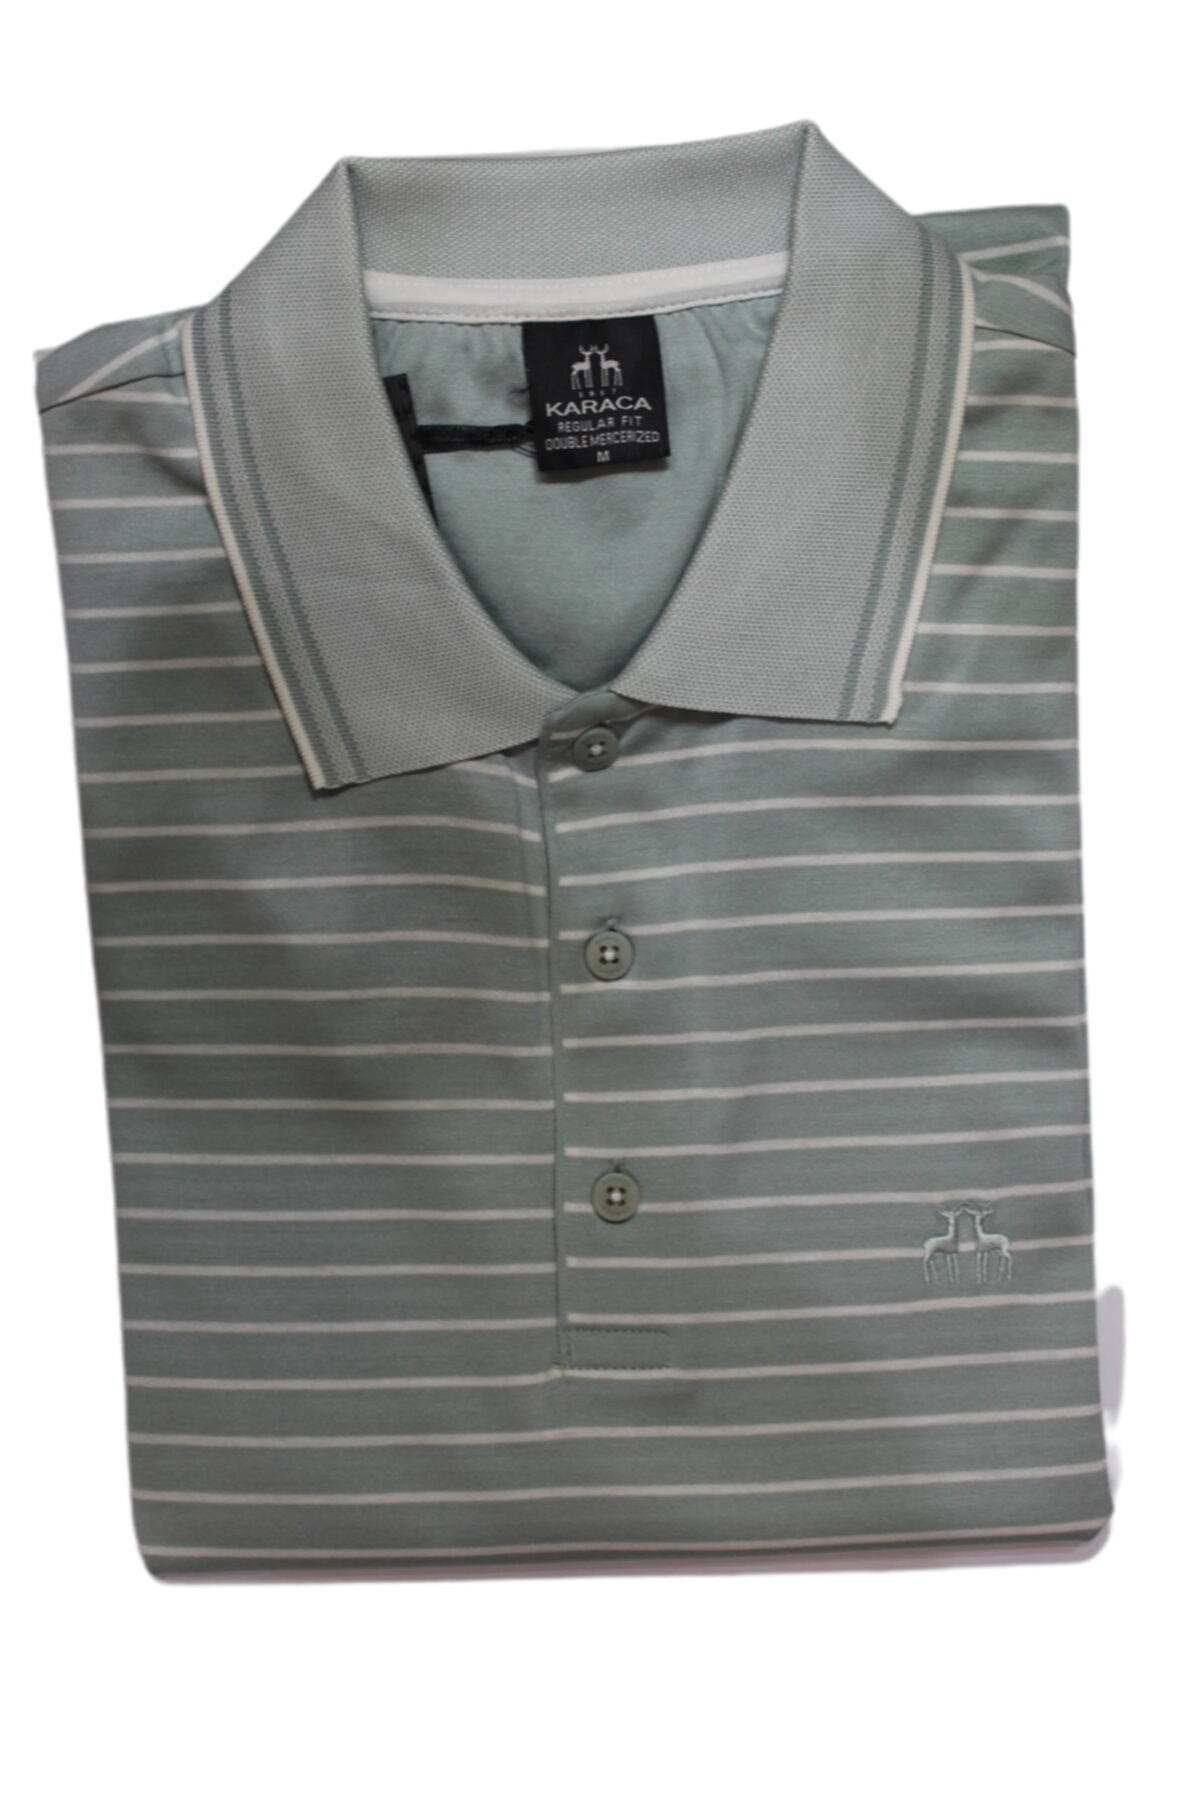 Karaca Erkek Çift Geyik Düğmeli Cepli Merserize Polo Yaka T-shirt 1